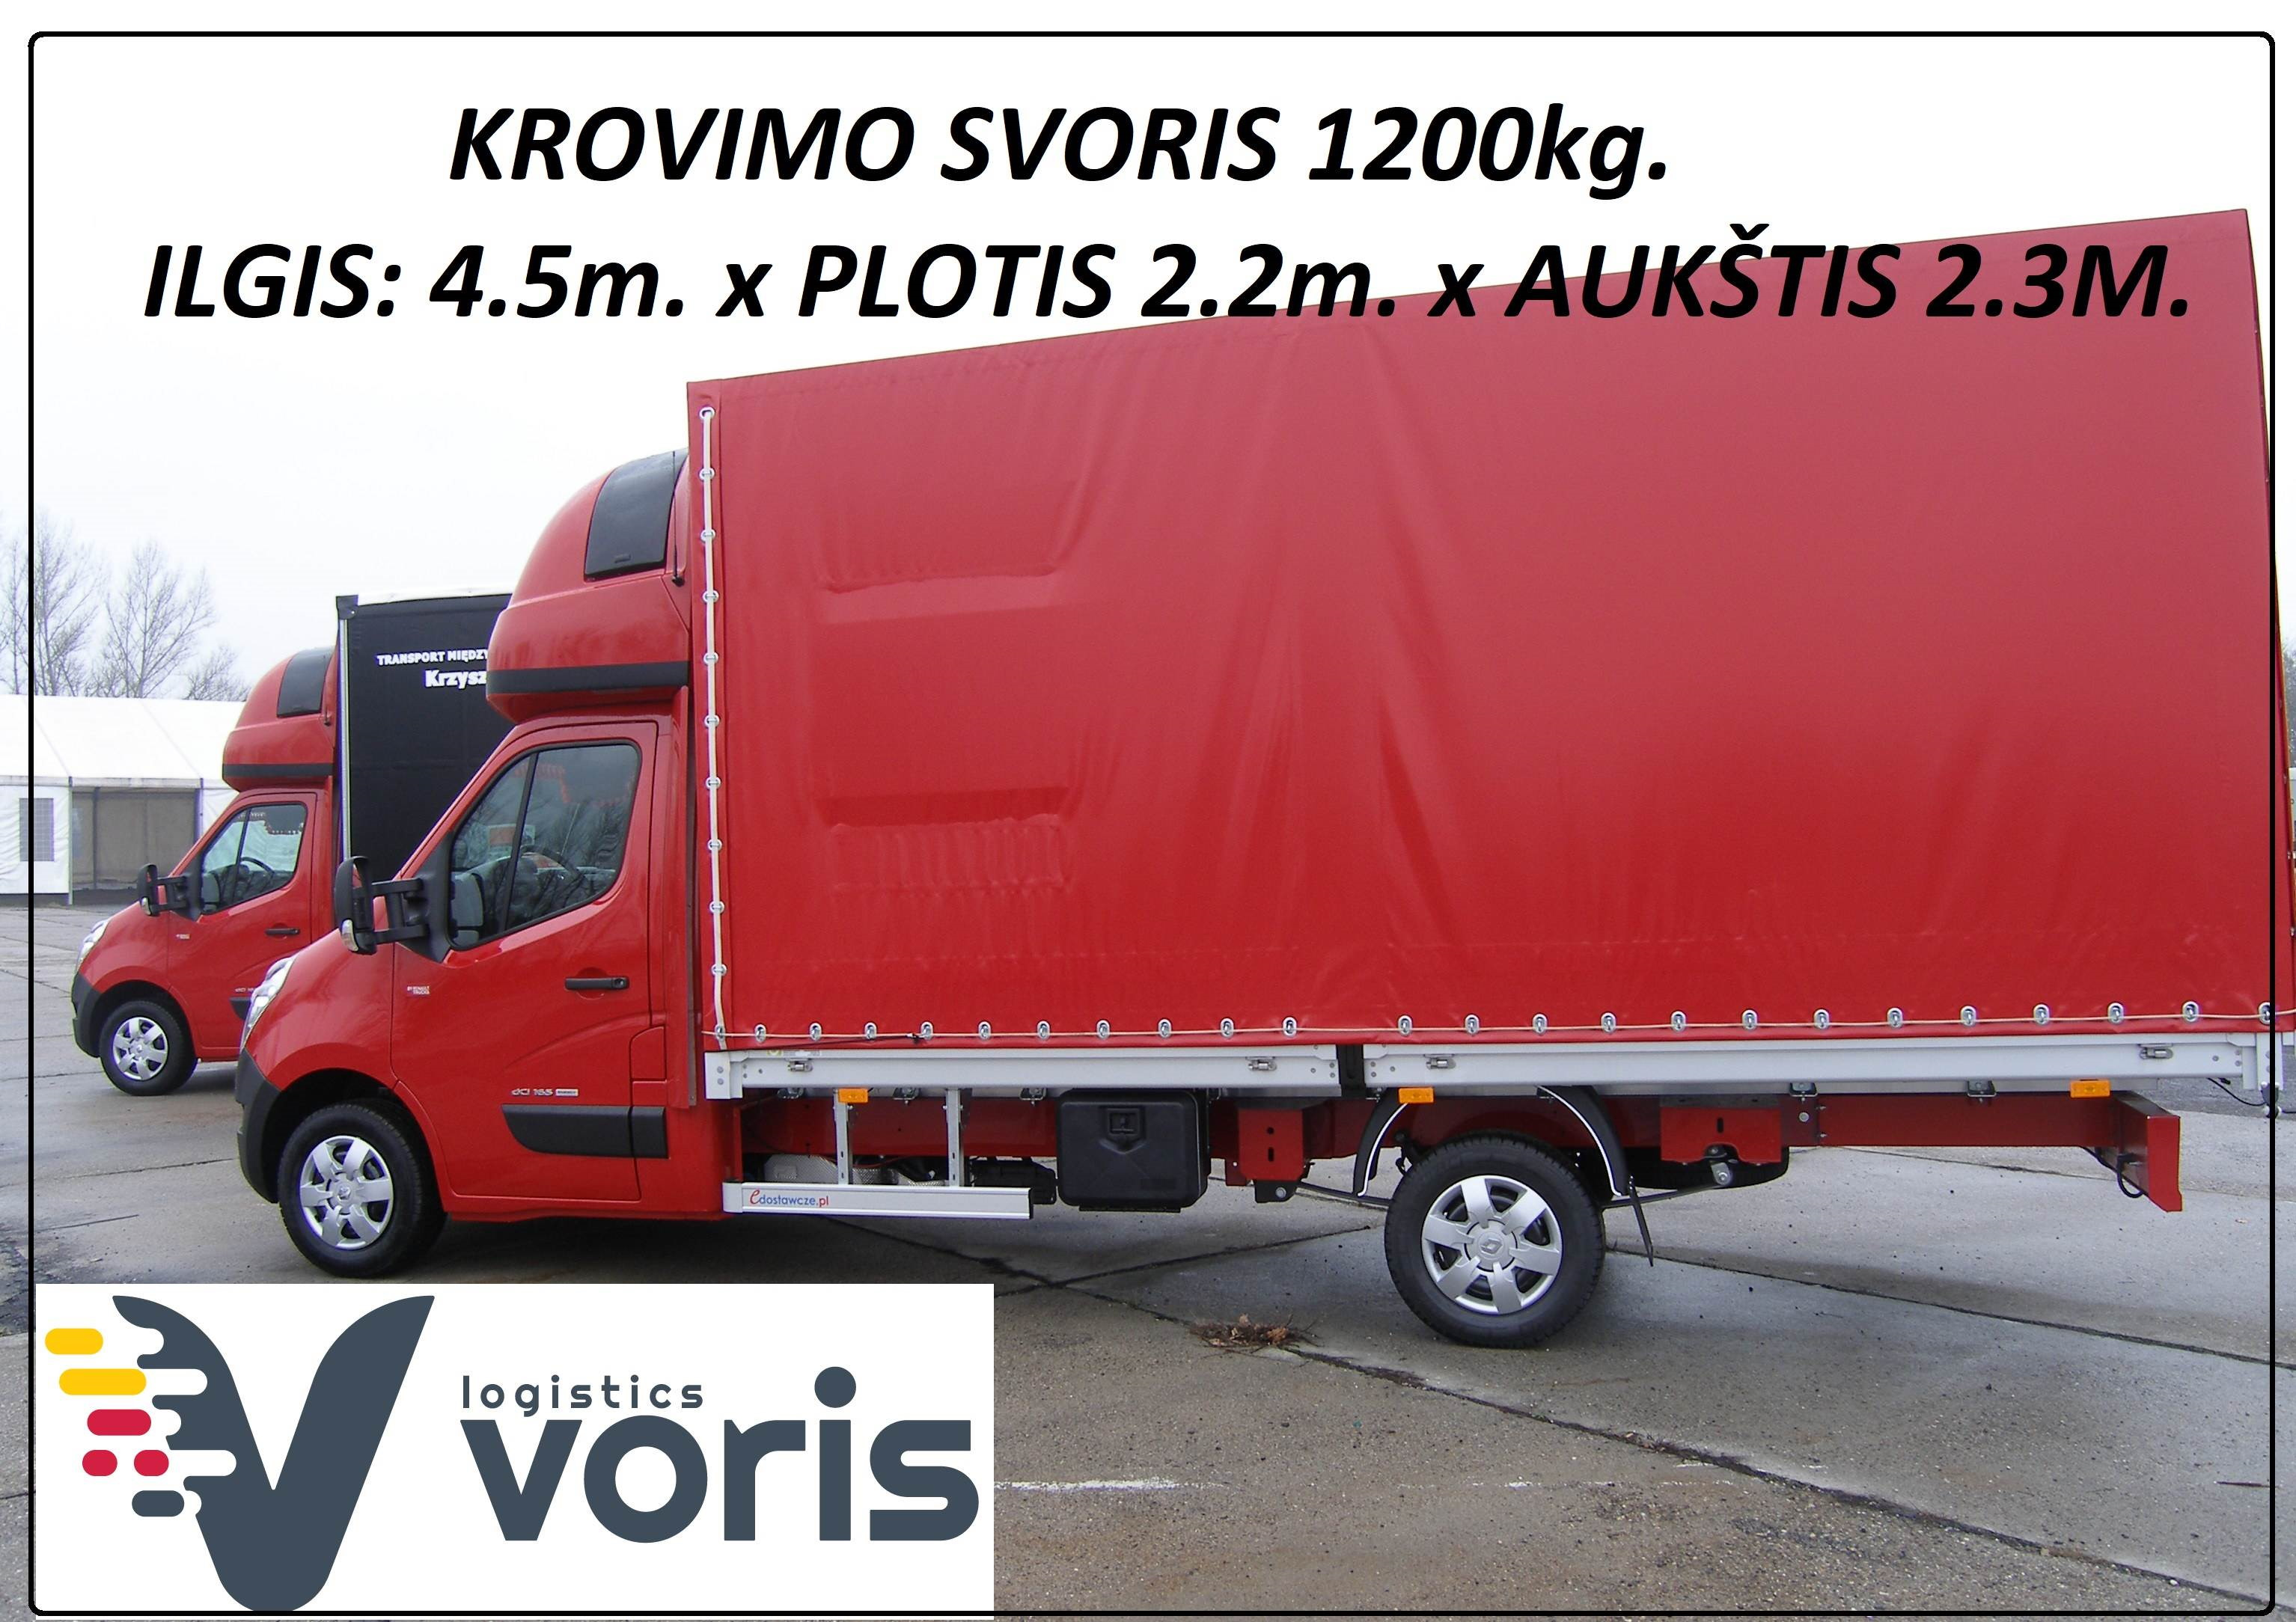 Skubus  krovinių gabenimas Europoje LIETUVA - EUROPA - LIETUVA EL.PAŠTAS: info@voris.lt SKYPE: voris.uab TEL.NR.: +37067247506 viber: voris ( +3706724